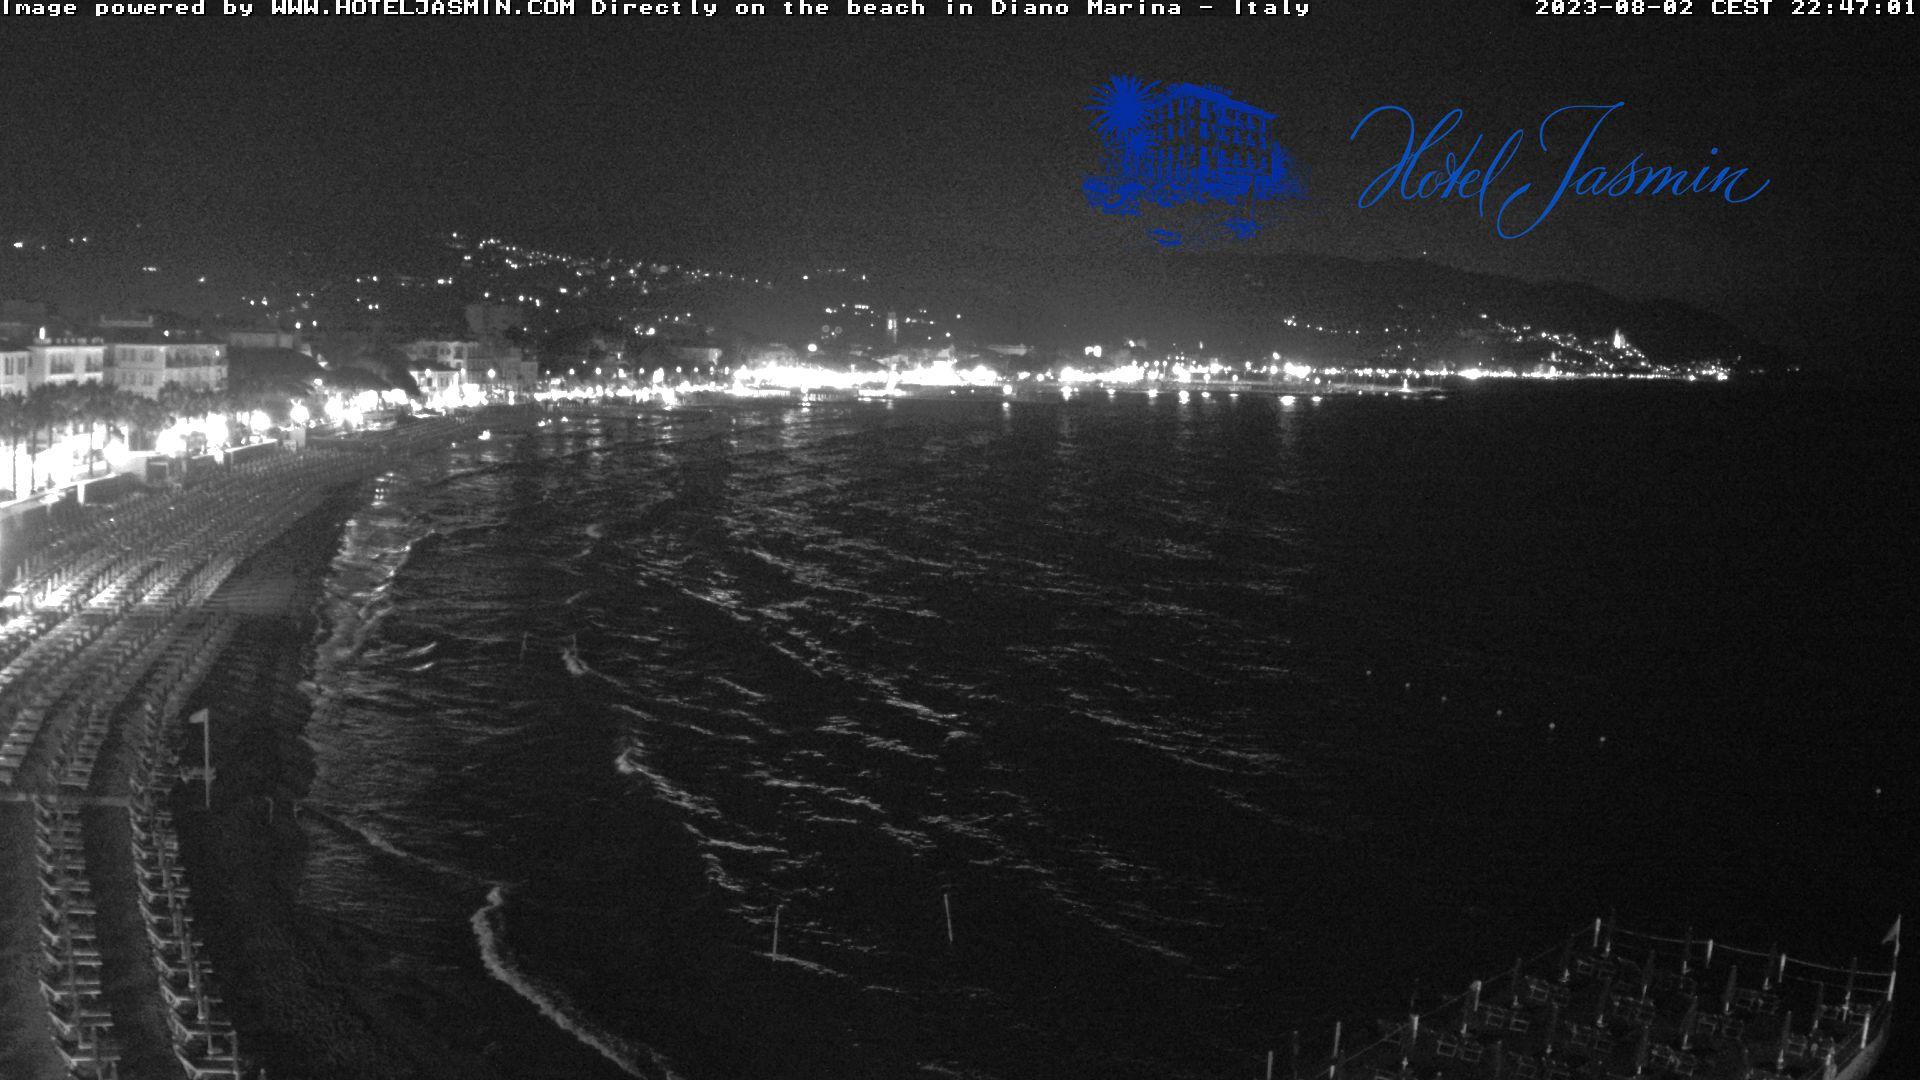 Diano Marina Strand Von Diano Marina Webcam Galore